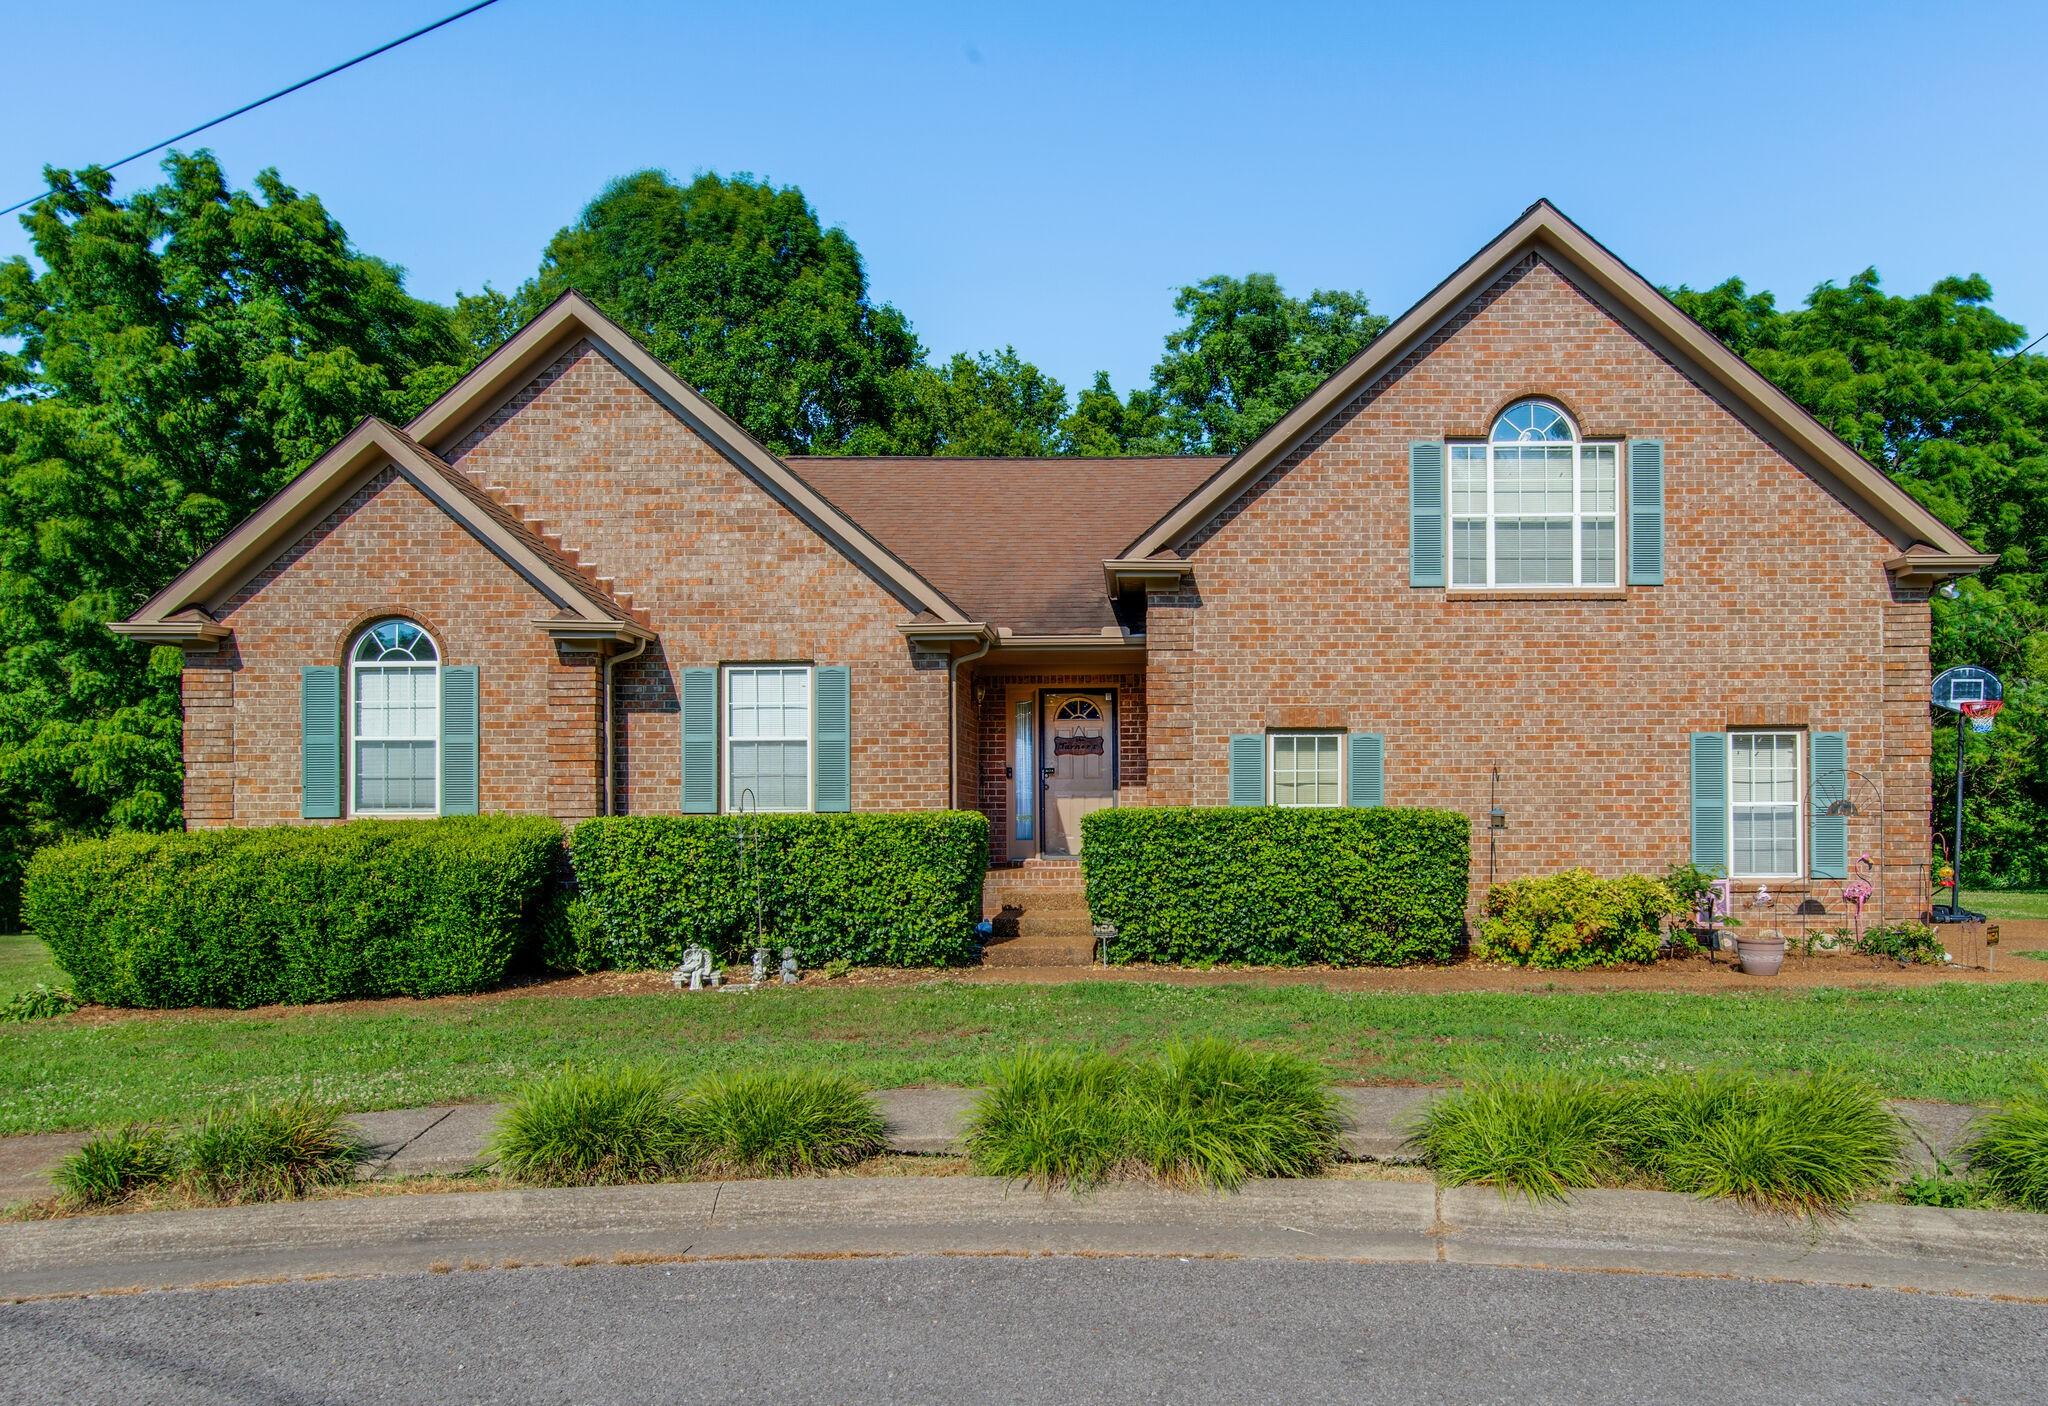 689 Williamsport Ct Property Photo - Nashville, TN real estate listing